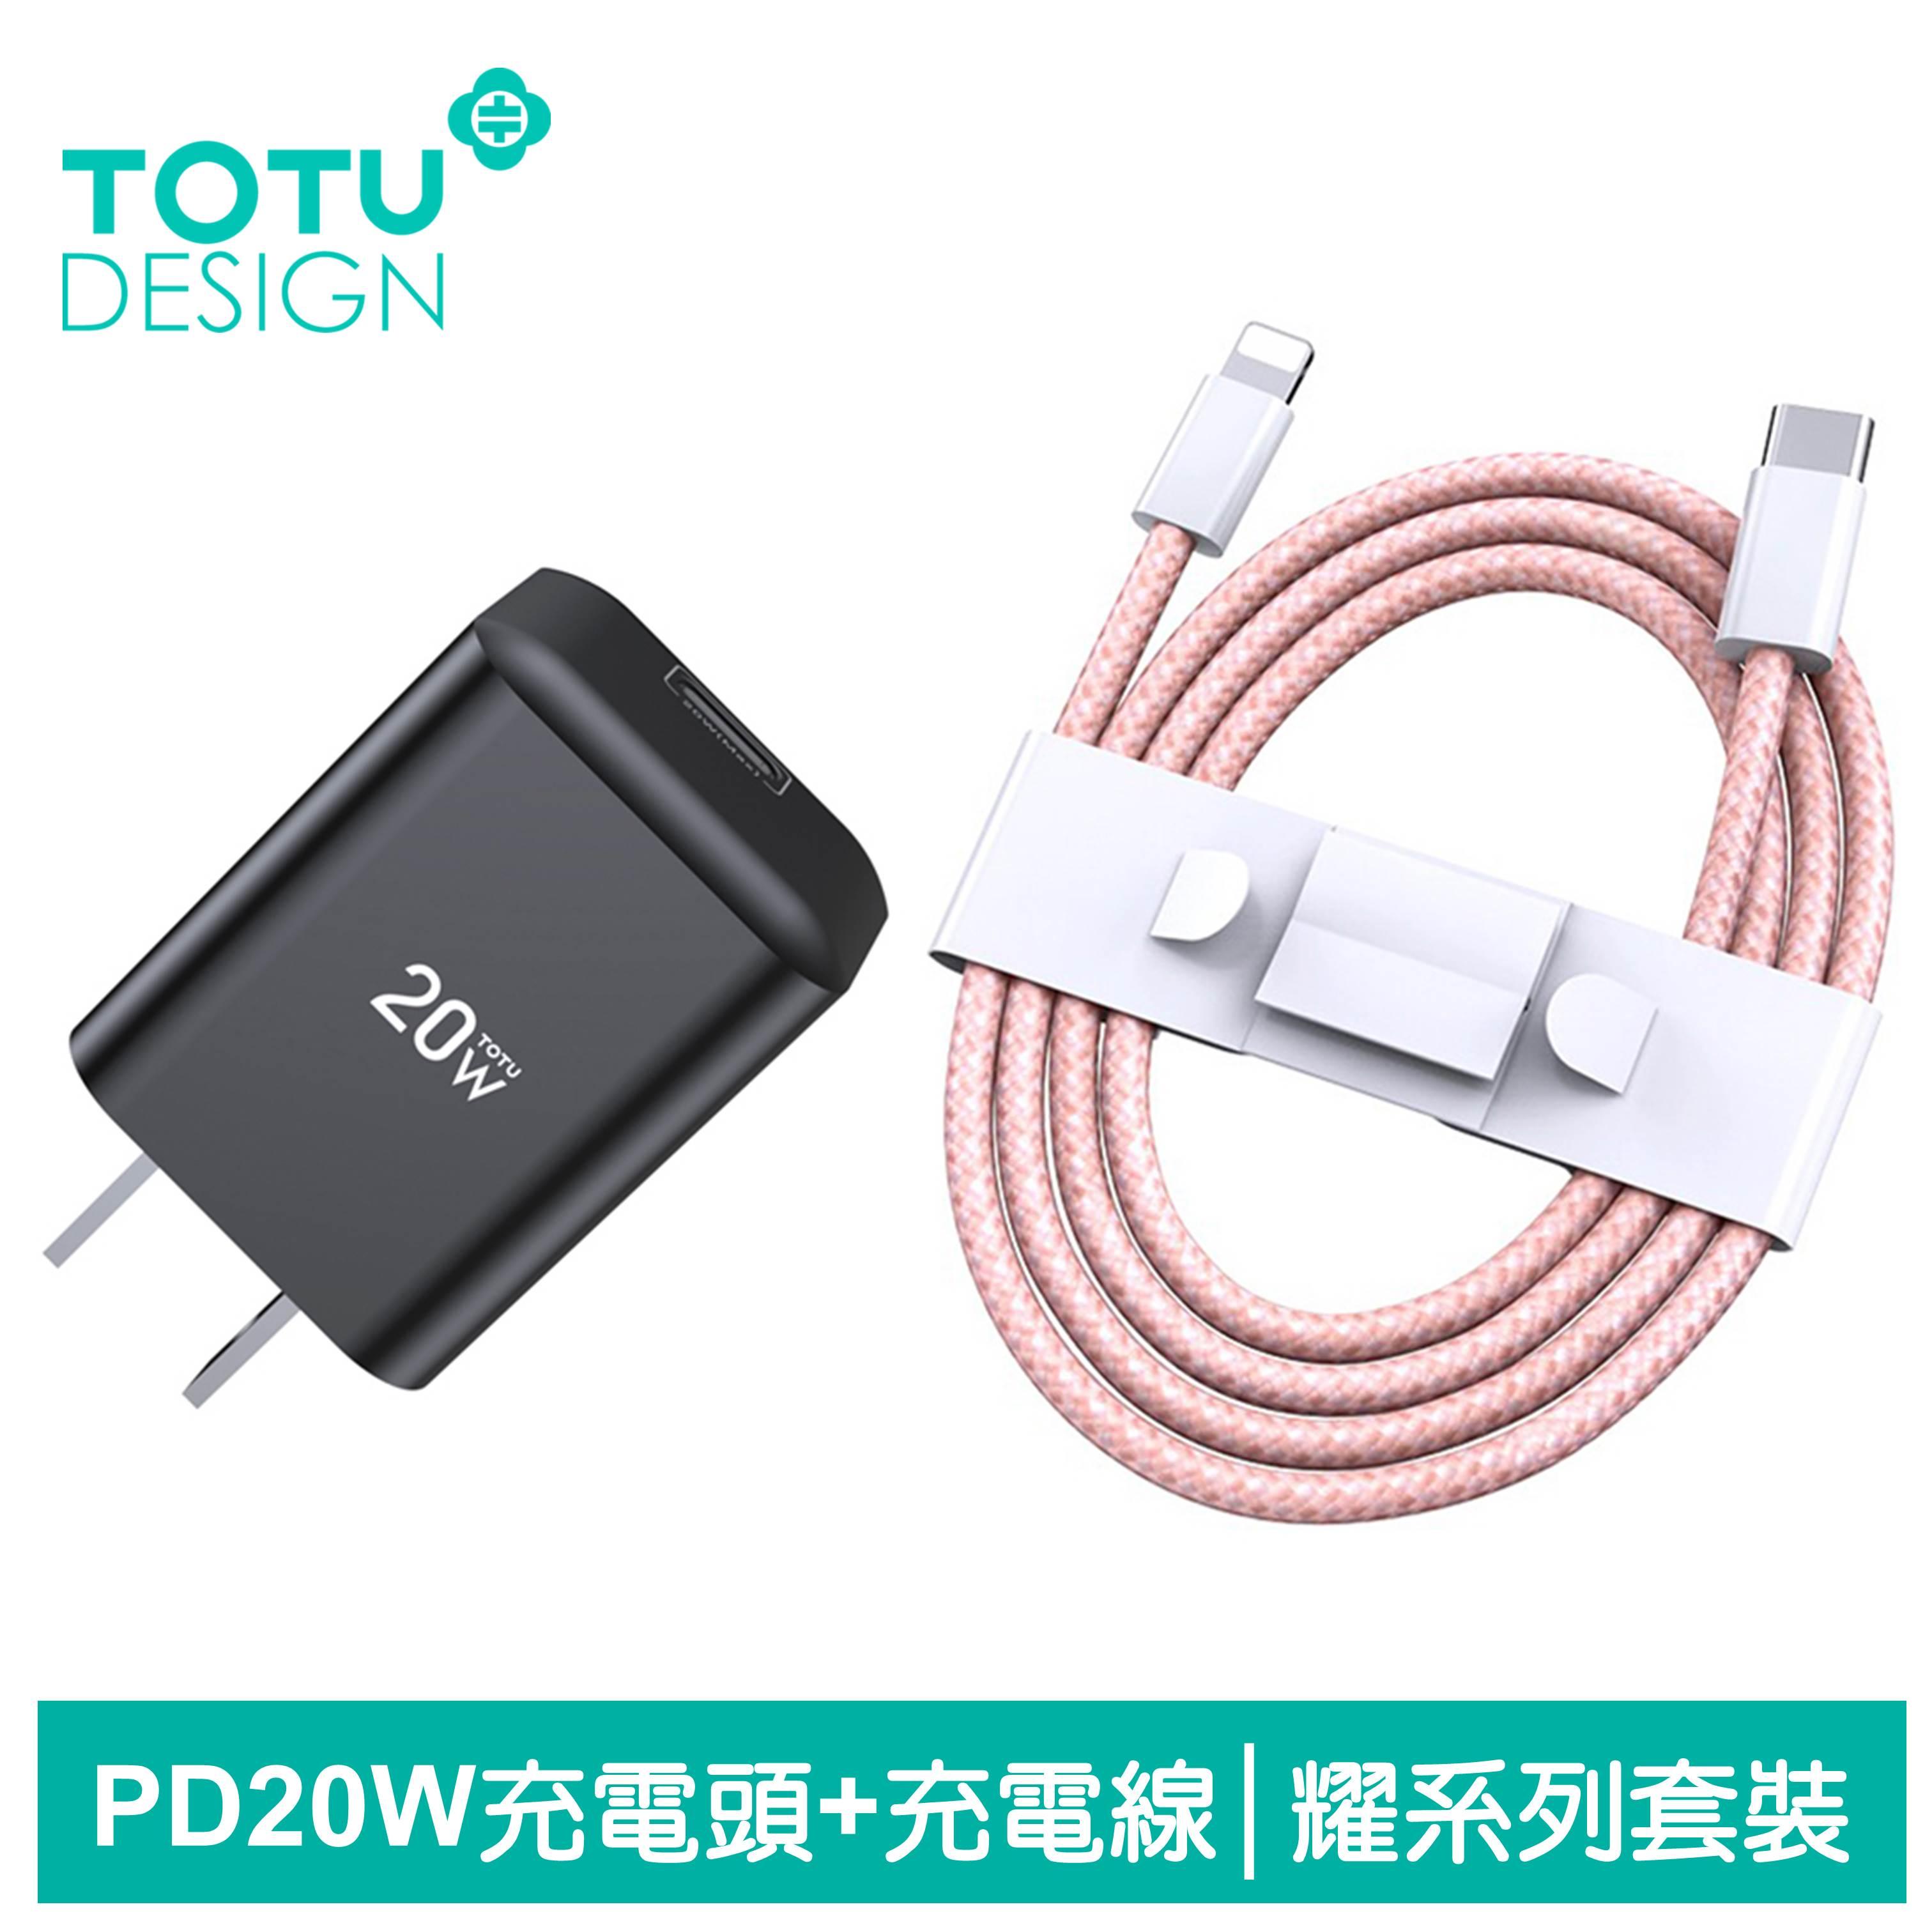 TOTU台灣官方 PD/iPhone充電線充電器充電頭傳輸線快充線快充頭 20W 耀彩套裝 黑色頭+粉色線